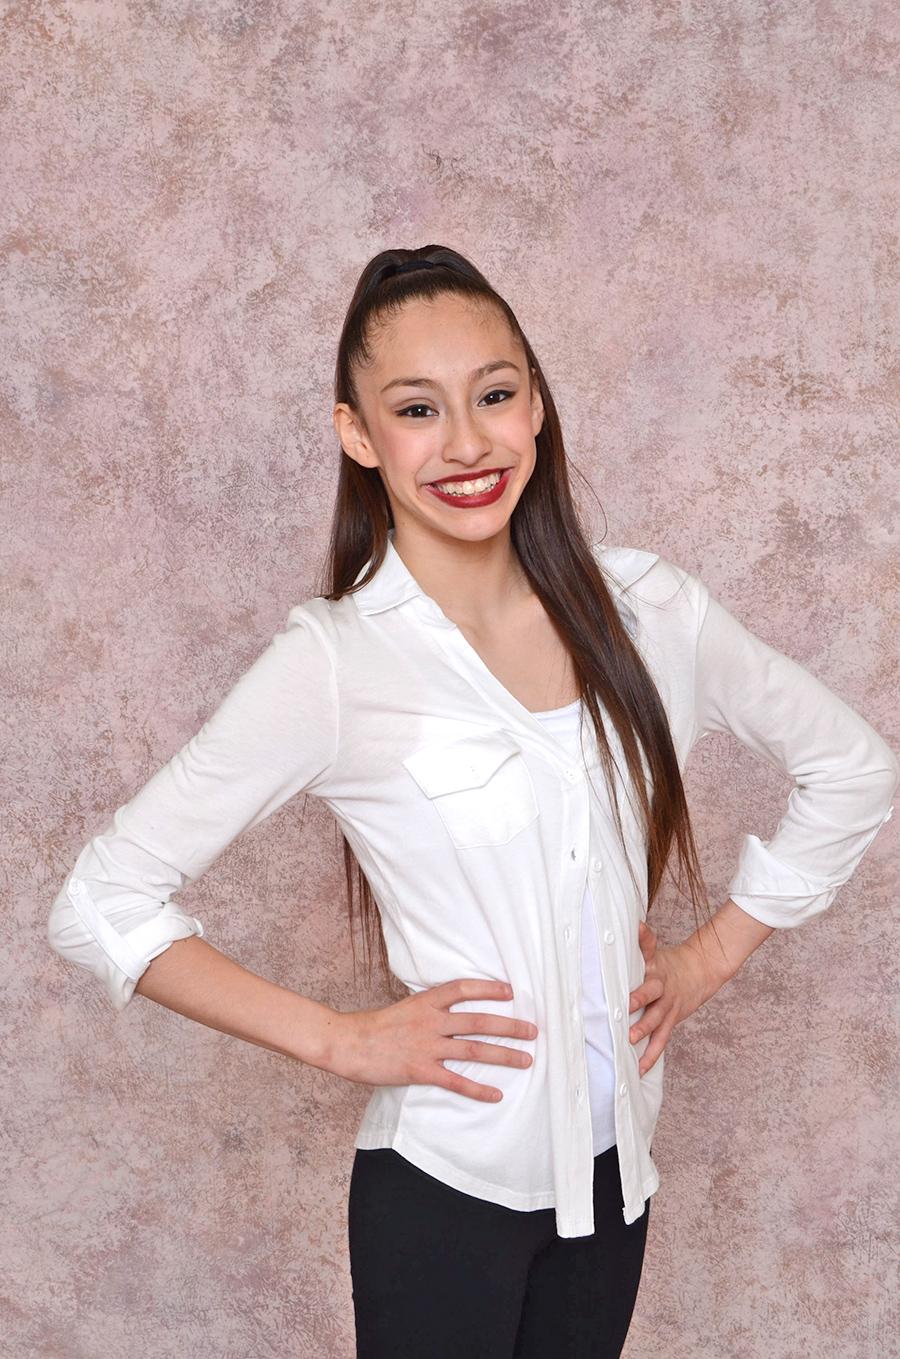 Susan's School of Dance Instructor Assistant - Sofia Celio